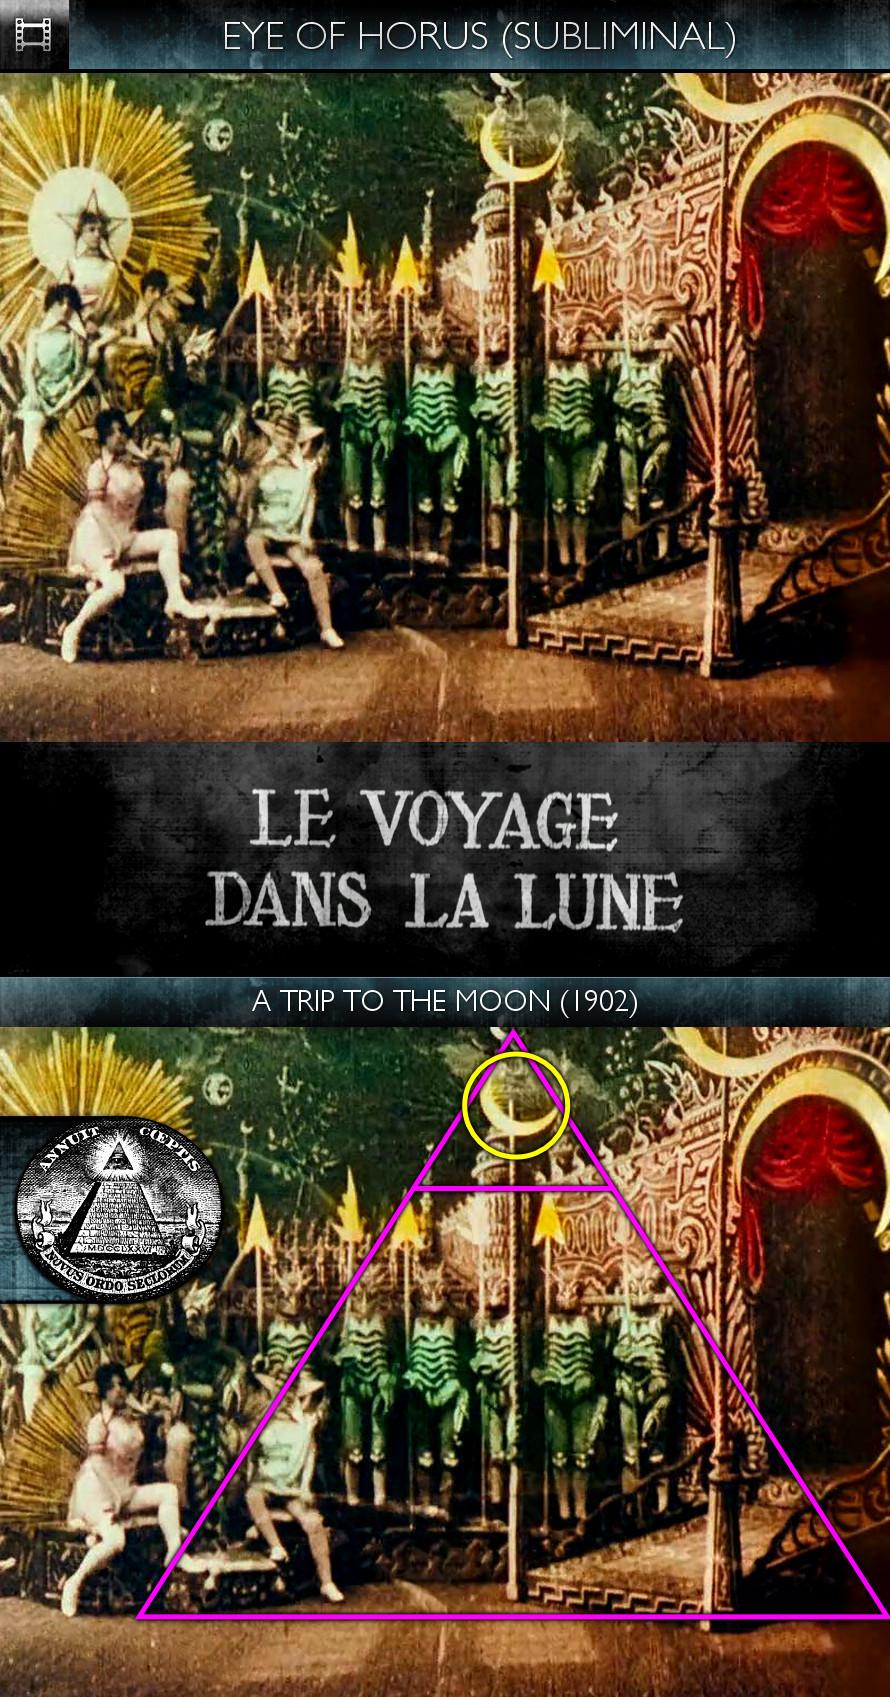 Voyage dans la Lune (A Trip to the Moon) (1902) - Eye of Horus - Subliminal